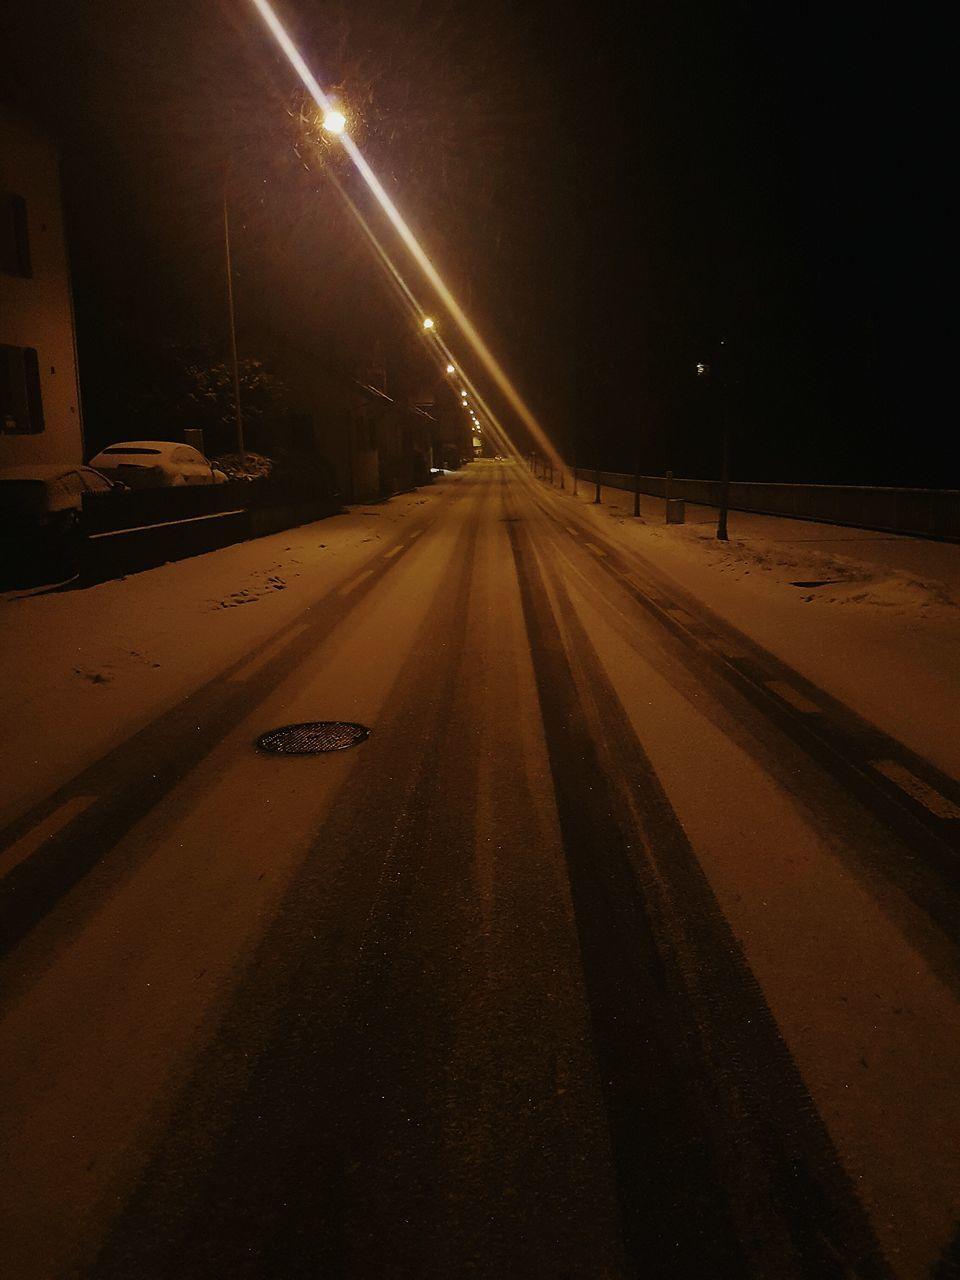 transportation, night, illuminated, car, the way forward, no people, road, land vehicle, street light, winter, outdoors, cold temperature, snow, nature, sky